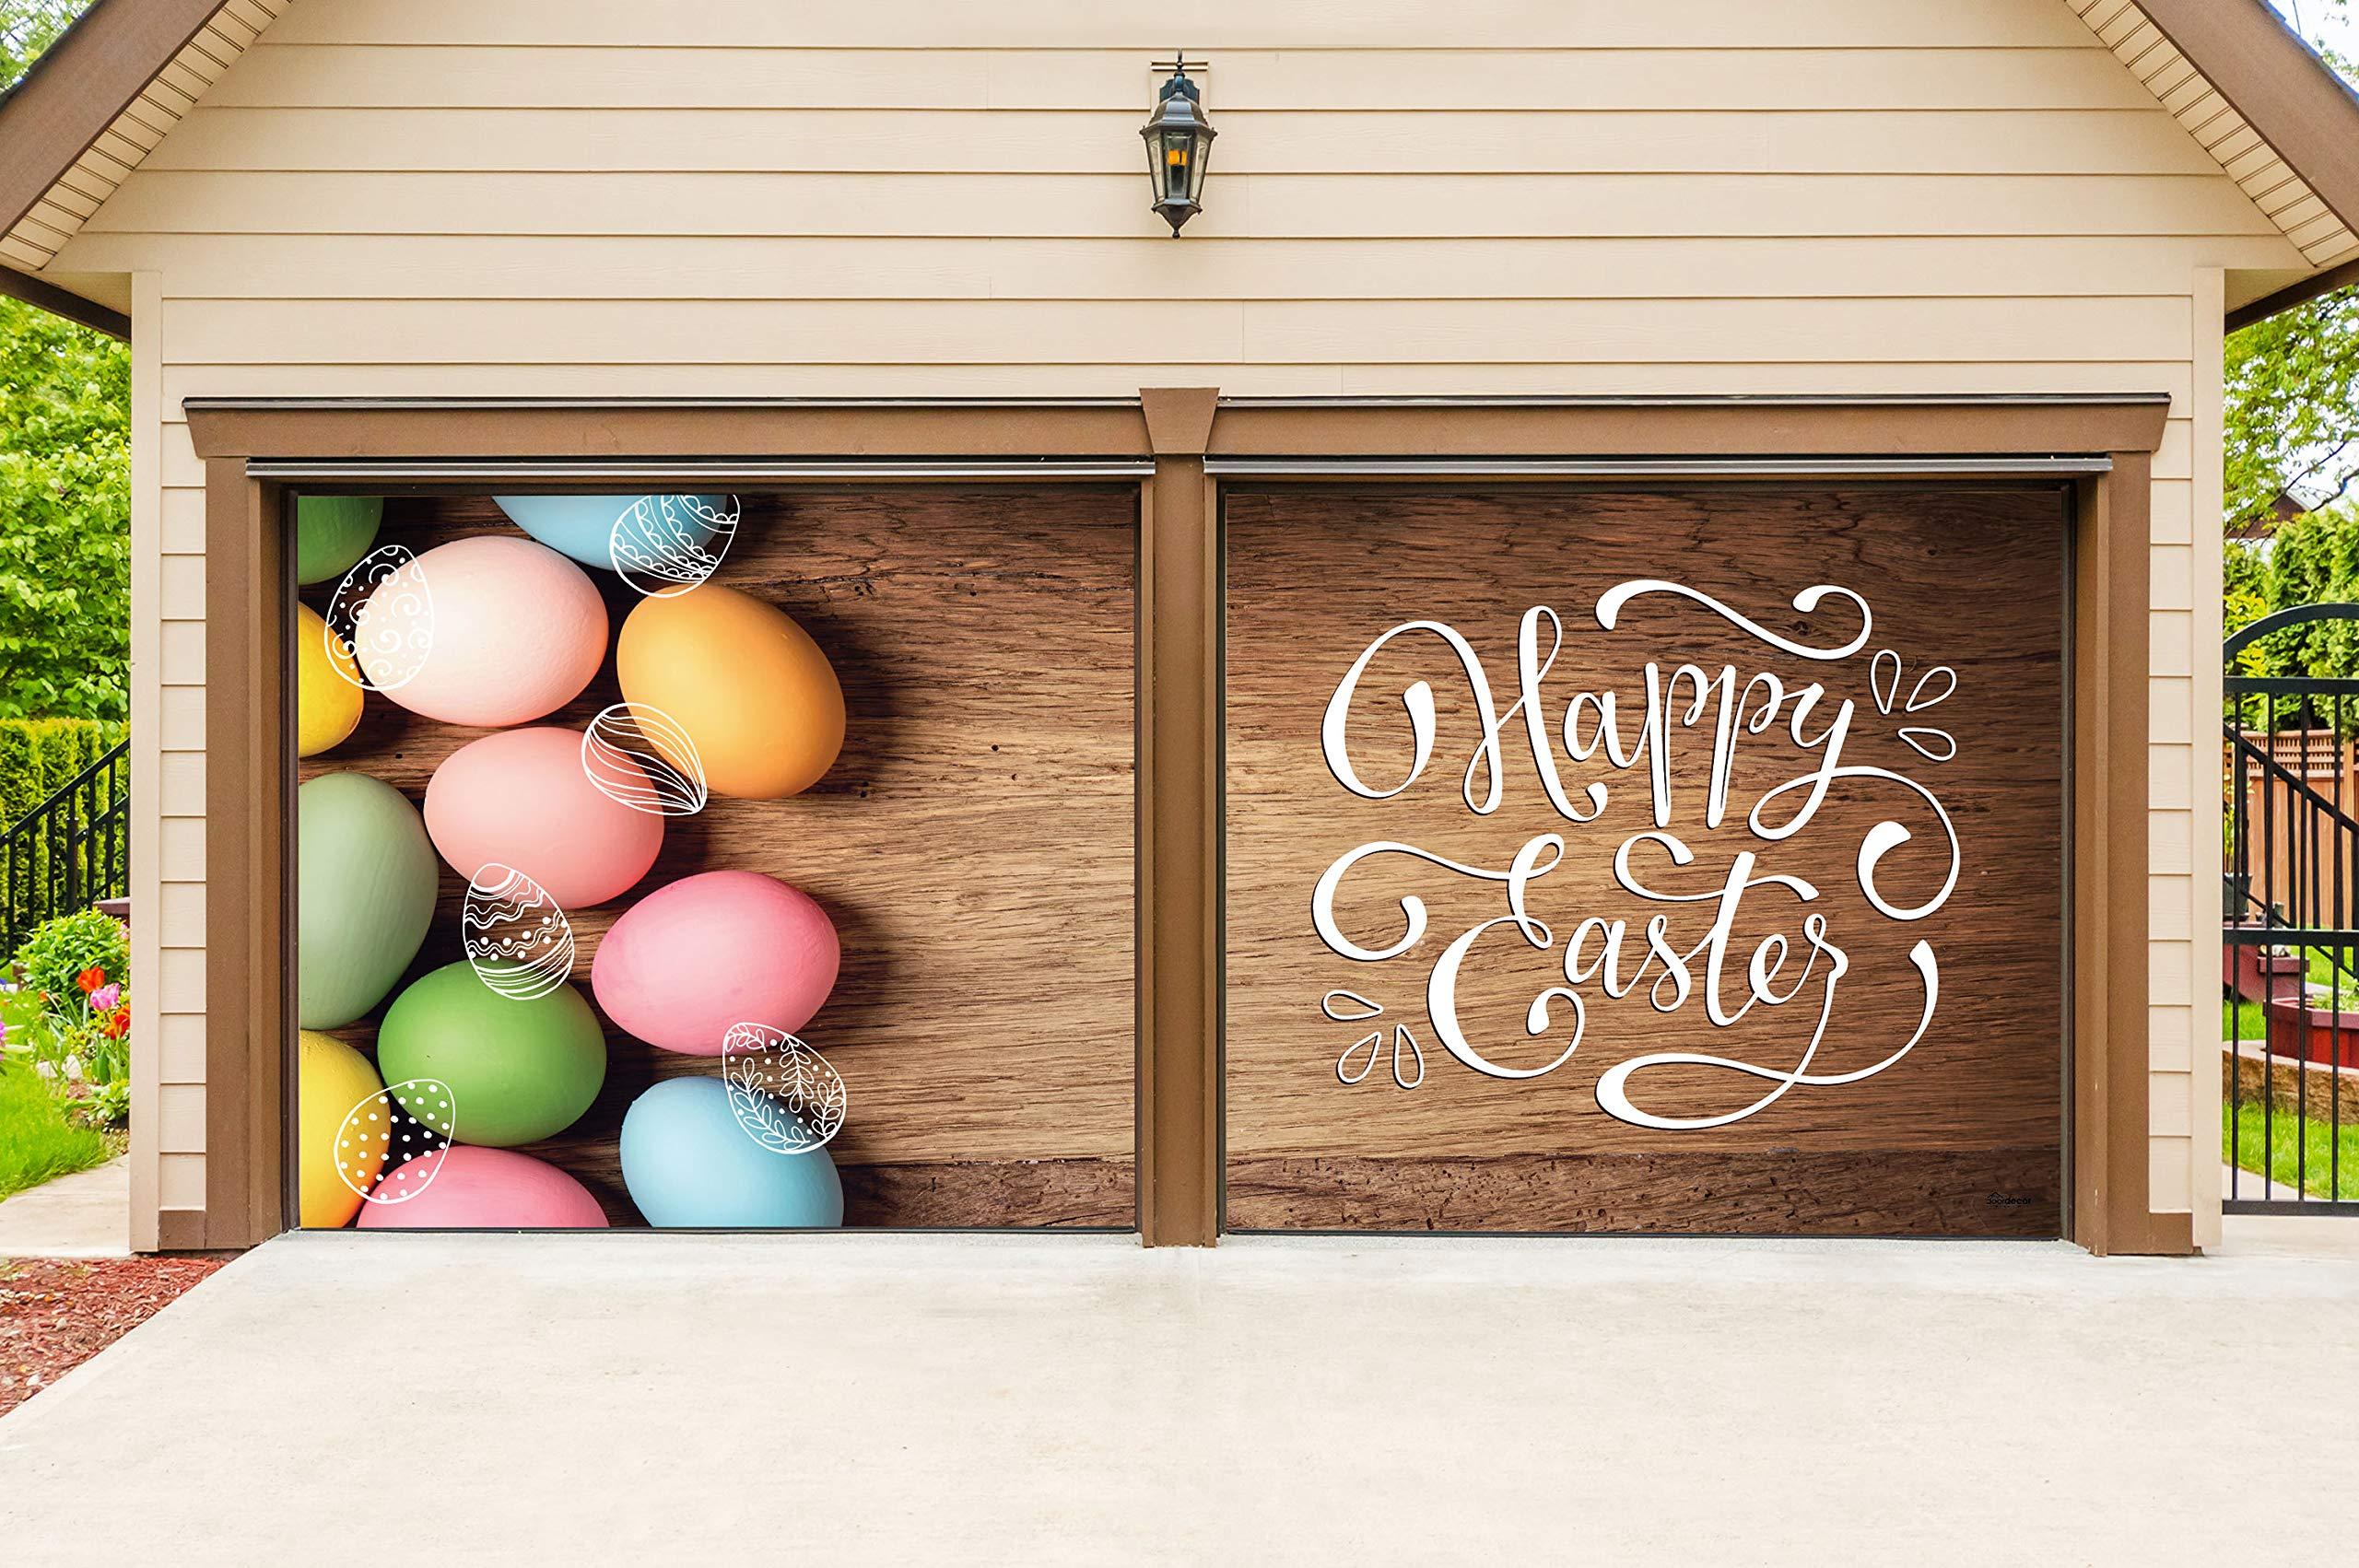 Victory Corps Happy Easter Eggs - Holiday Garage Door Banner Mural Sign Décor 7'x 8' Split Car Garage - The Original Holiday Garage Door Banner Decor